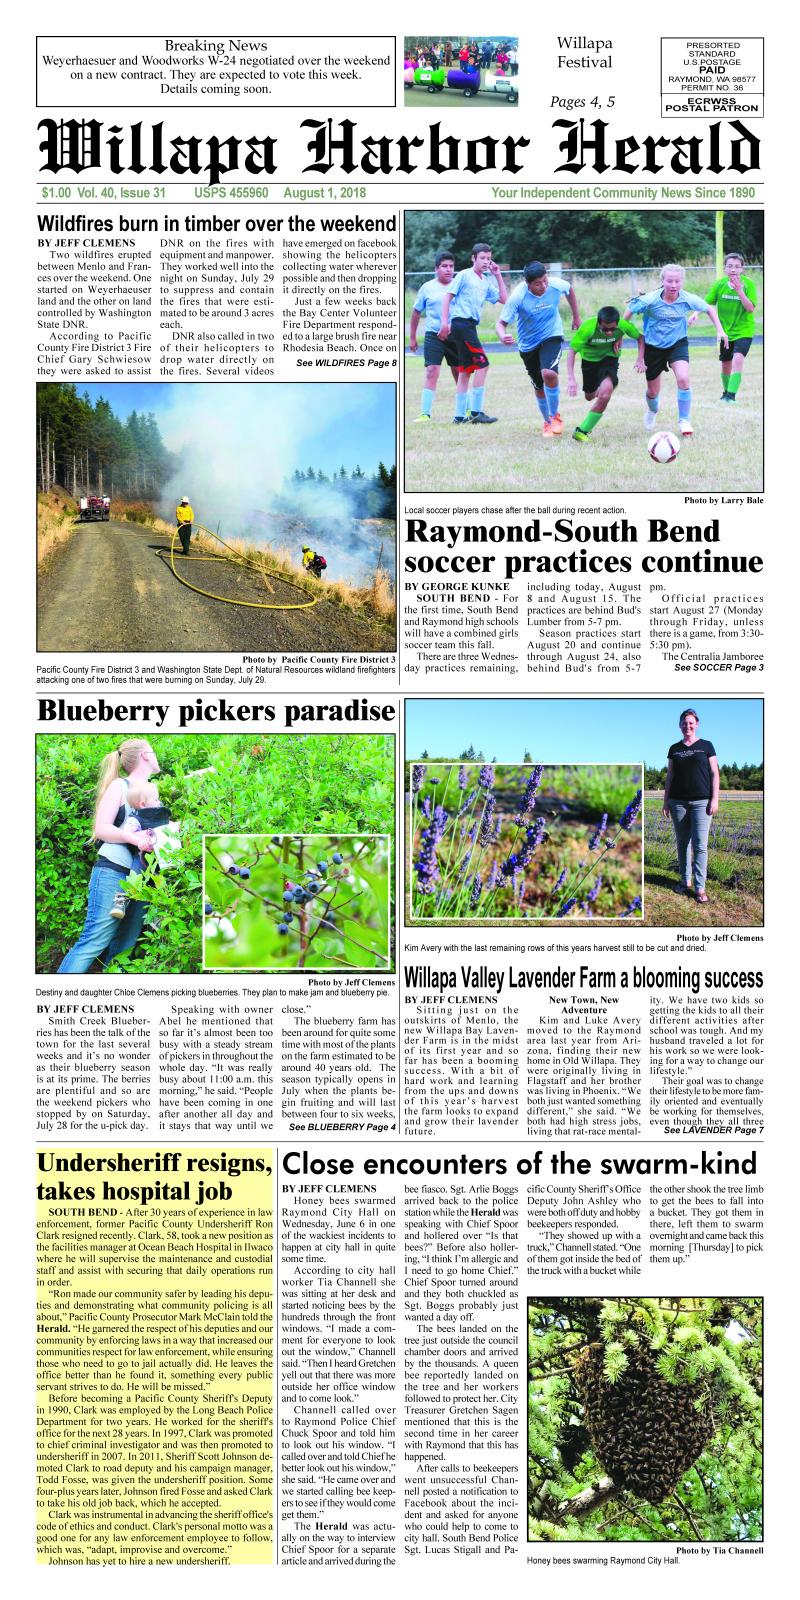 August 1, 2018 Willapa Harbor Herald